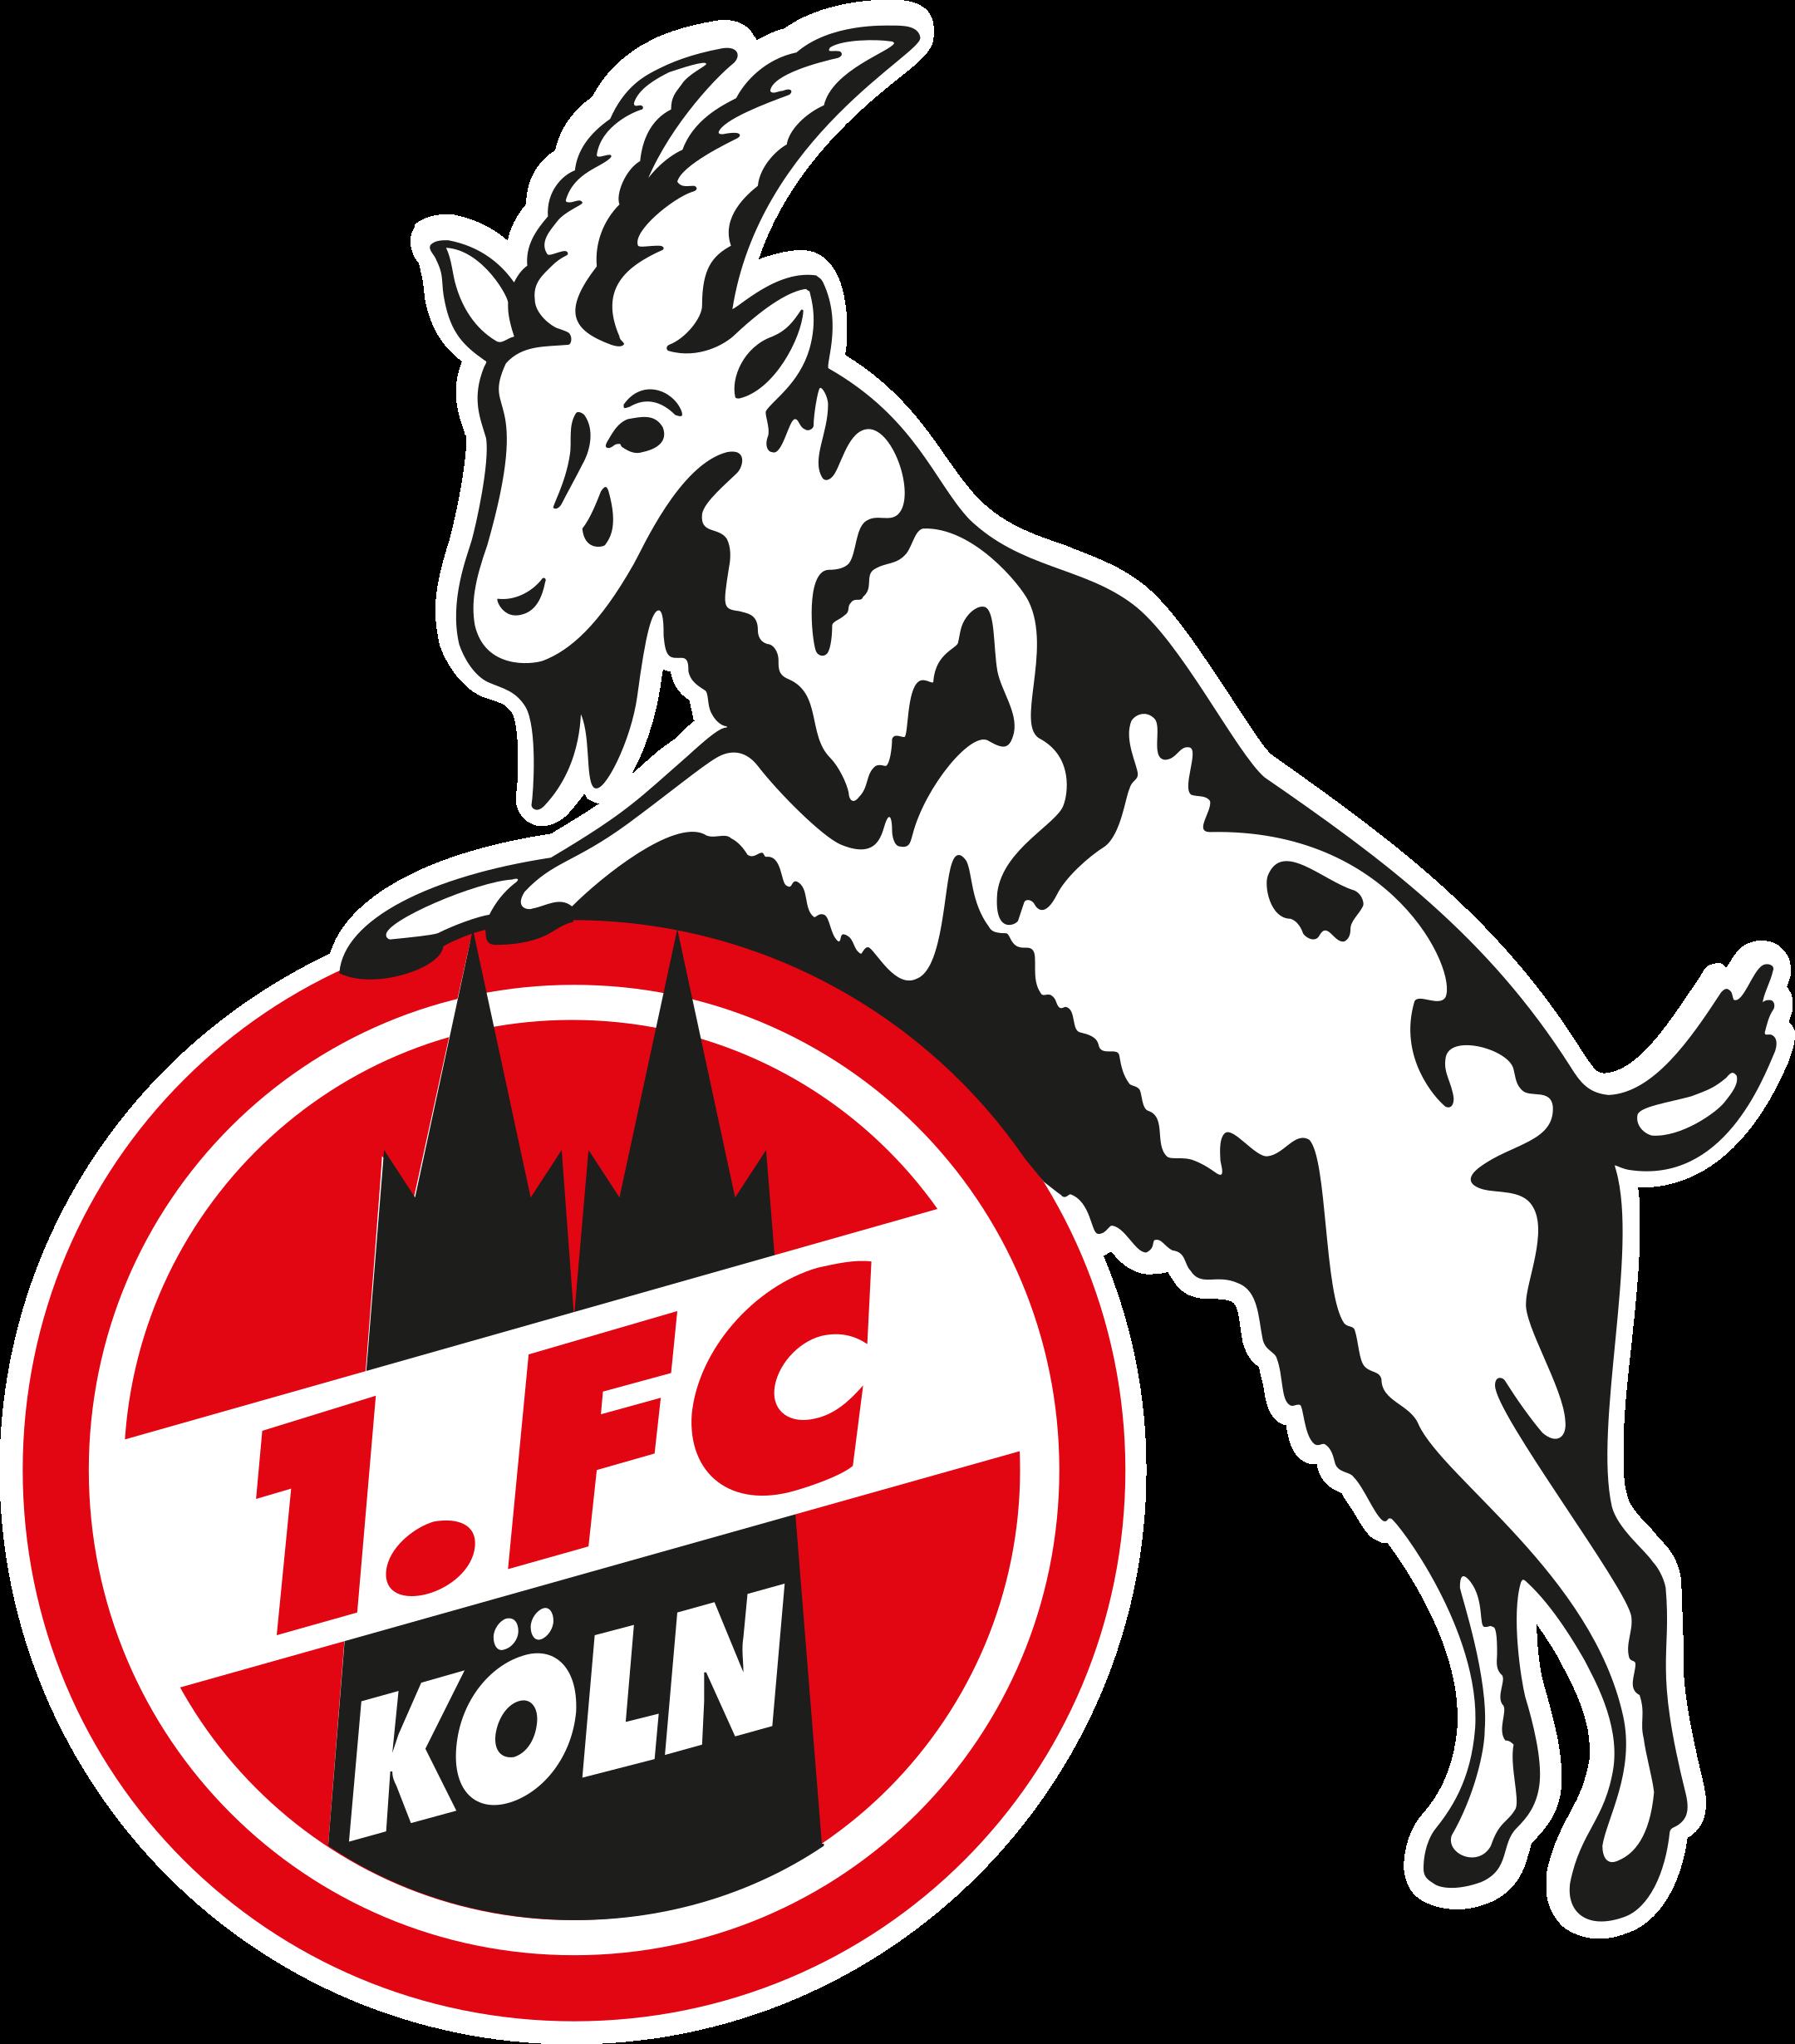 1 fc koln logo 1 - 1 FC Köln Logo